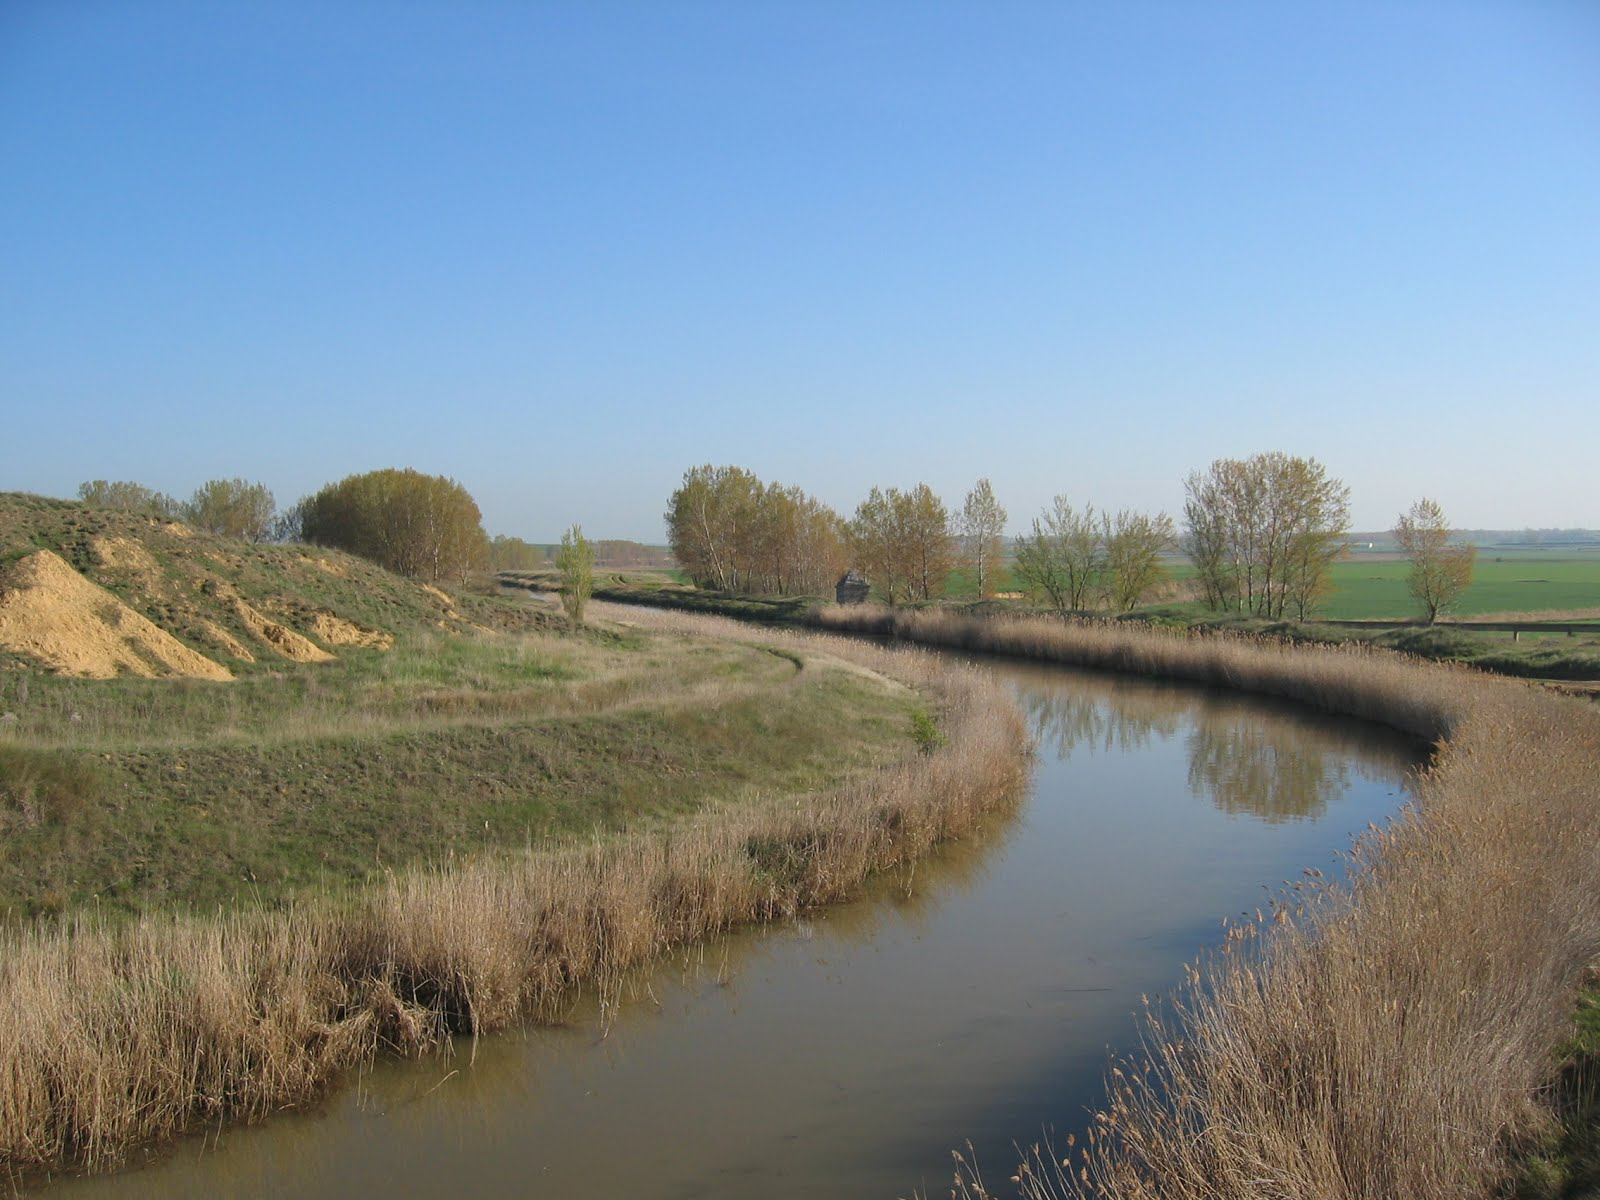 Canál de Castilla